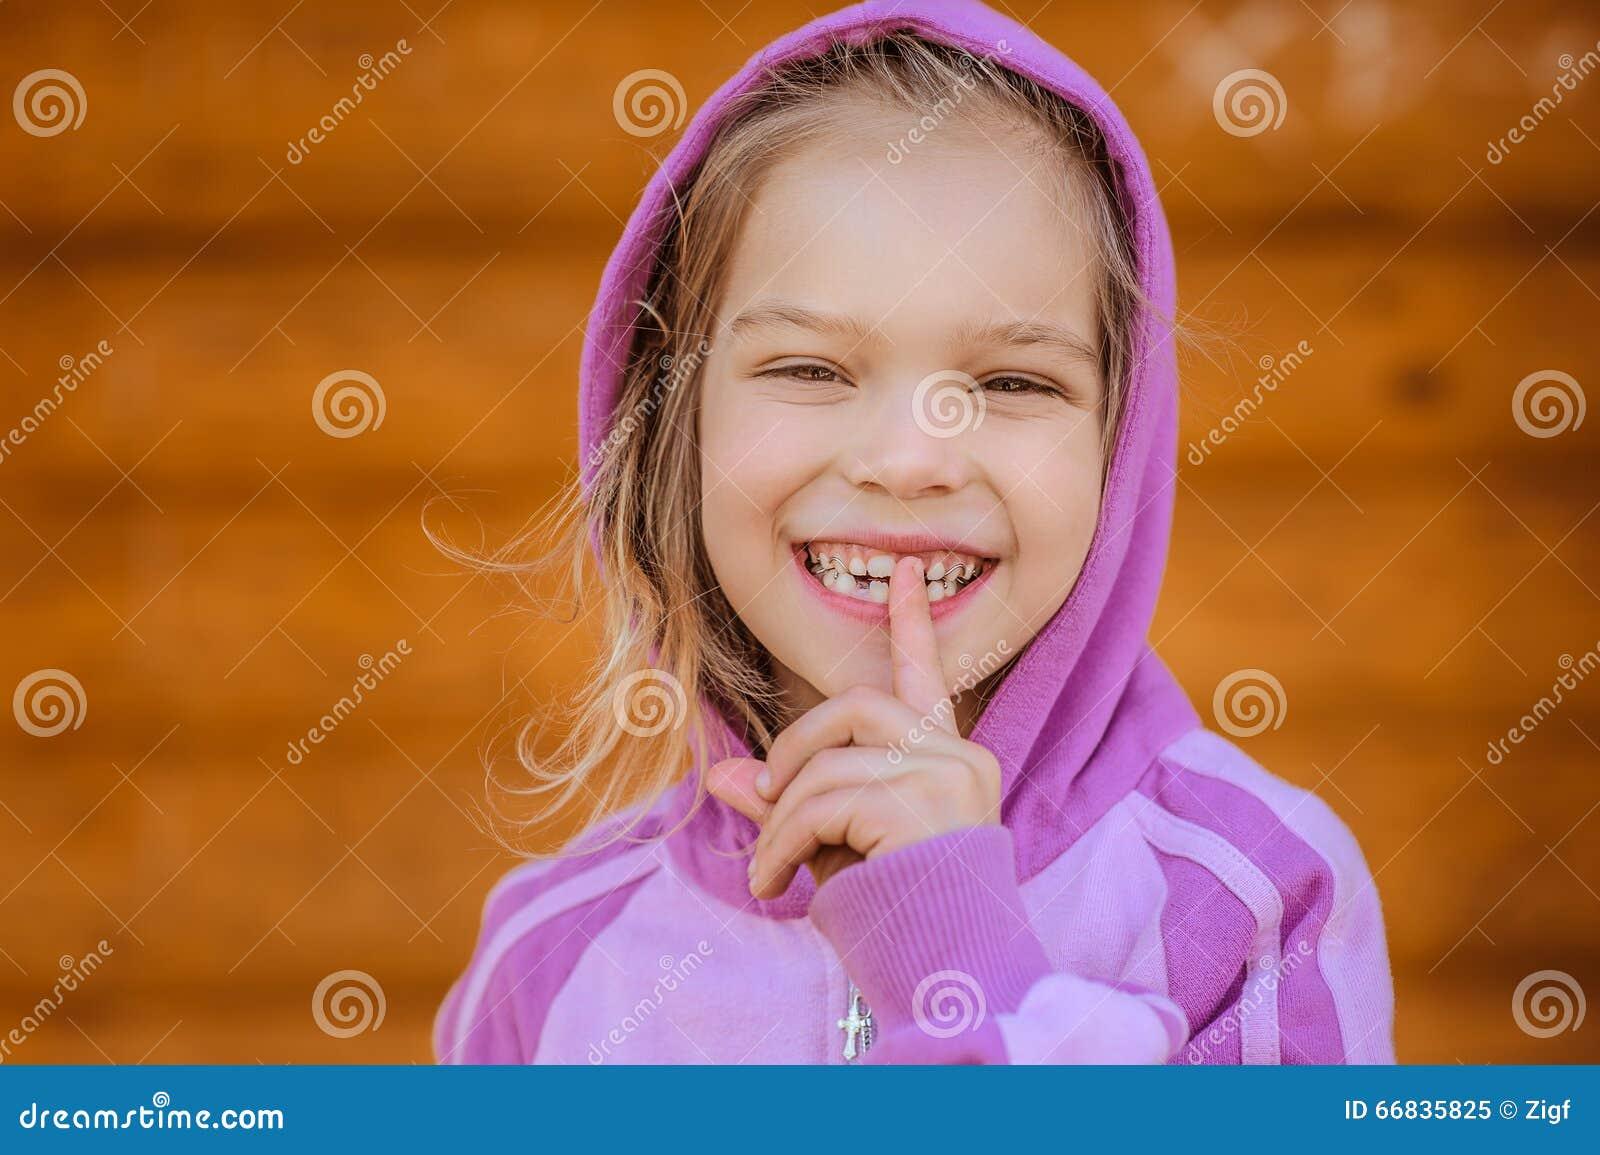 Weinig glimlachend meisje brengt wijsvinger aan lippen aan